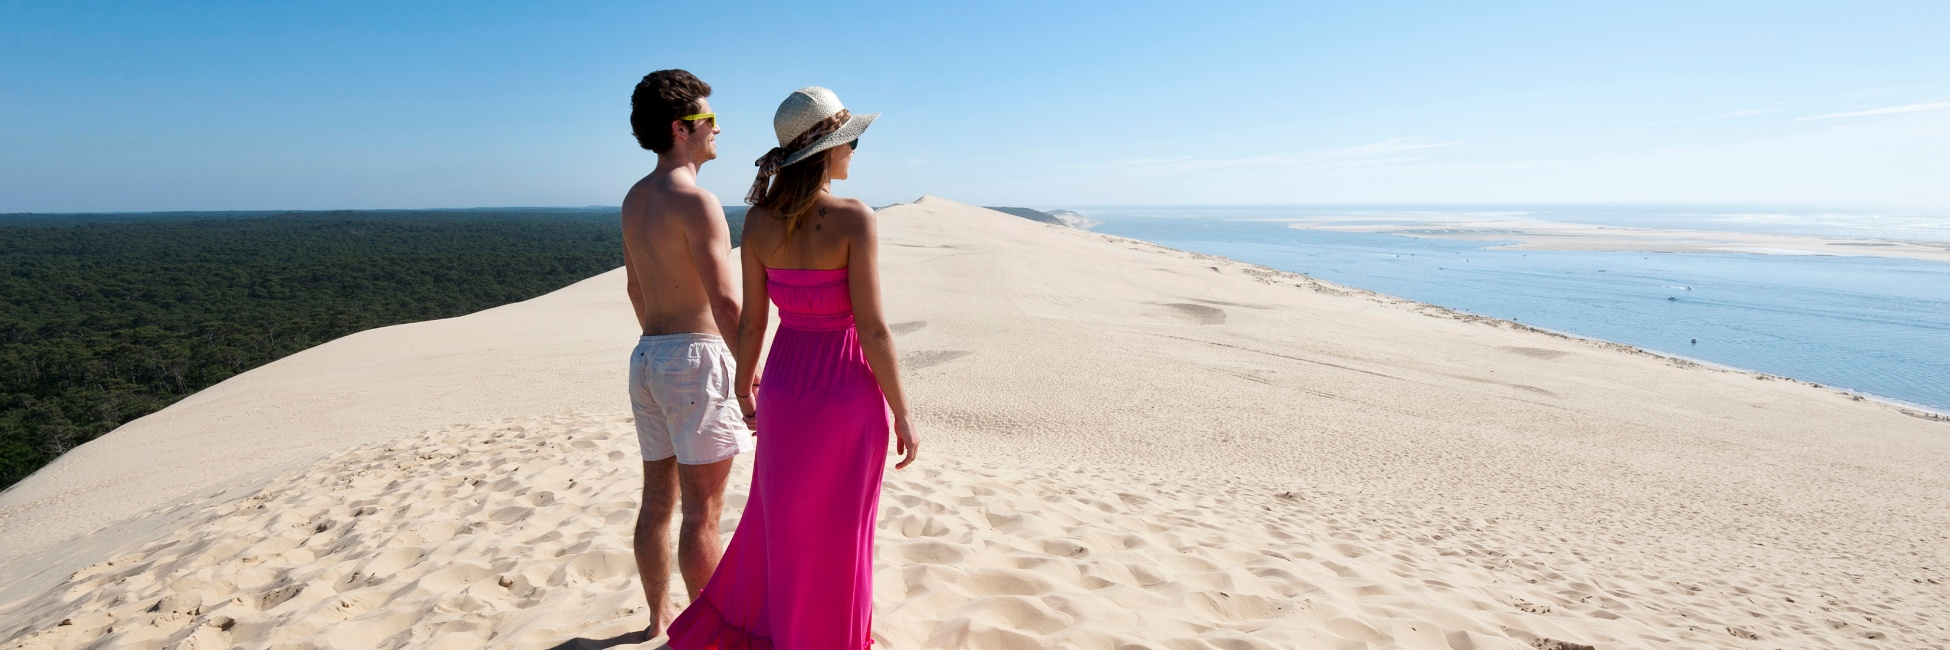 Dune à Arcachon en Gironde